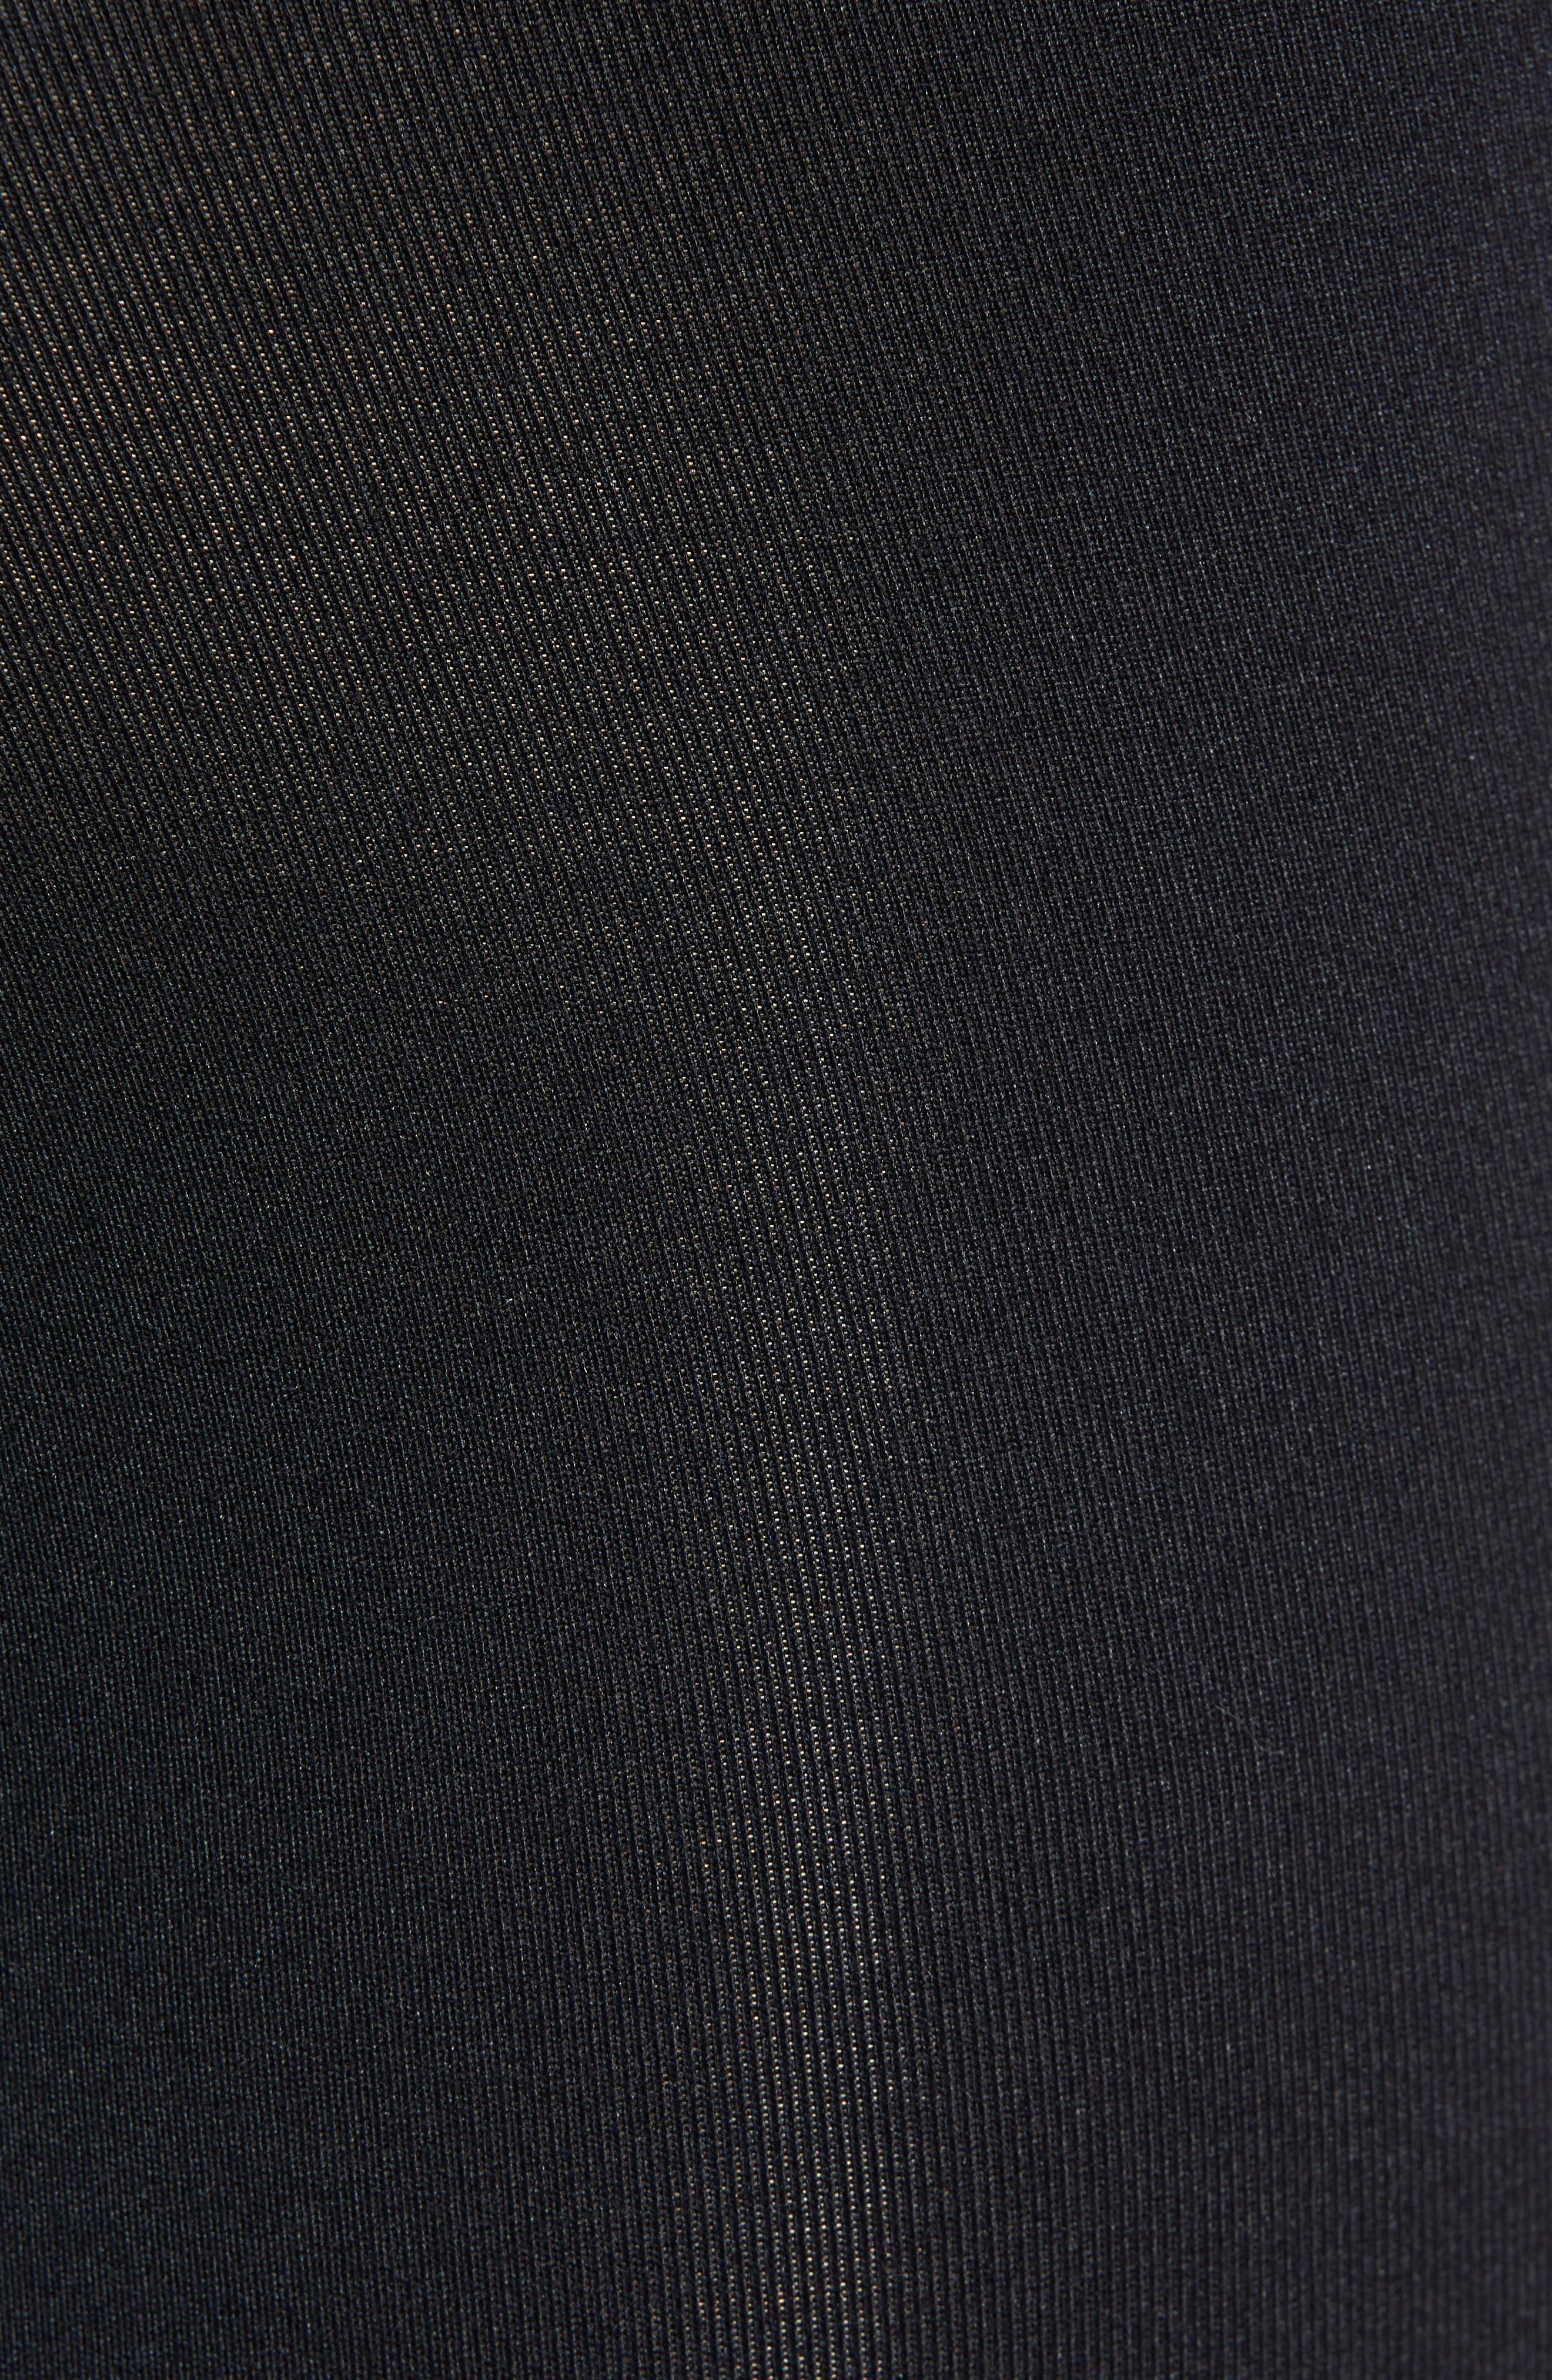 Pro Training Tights,                             Alternate thumbnail 5, color,                             BLACK/ ANTHRACITE/ BLACK